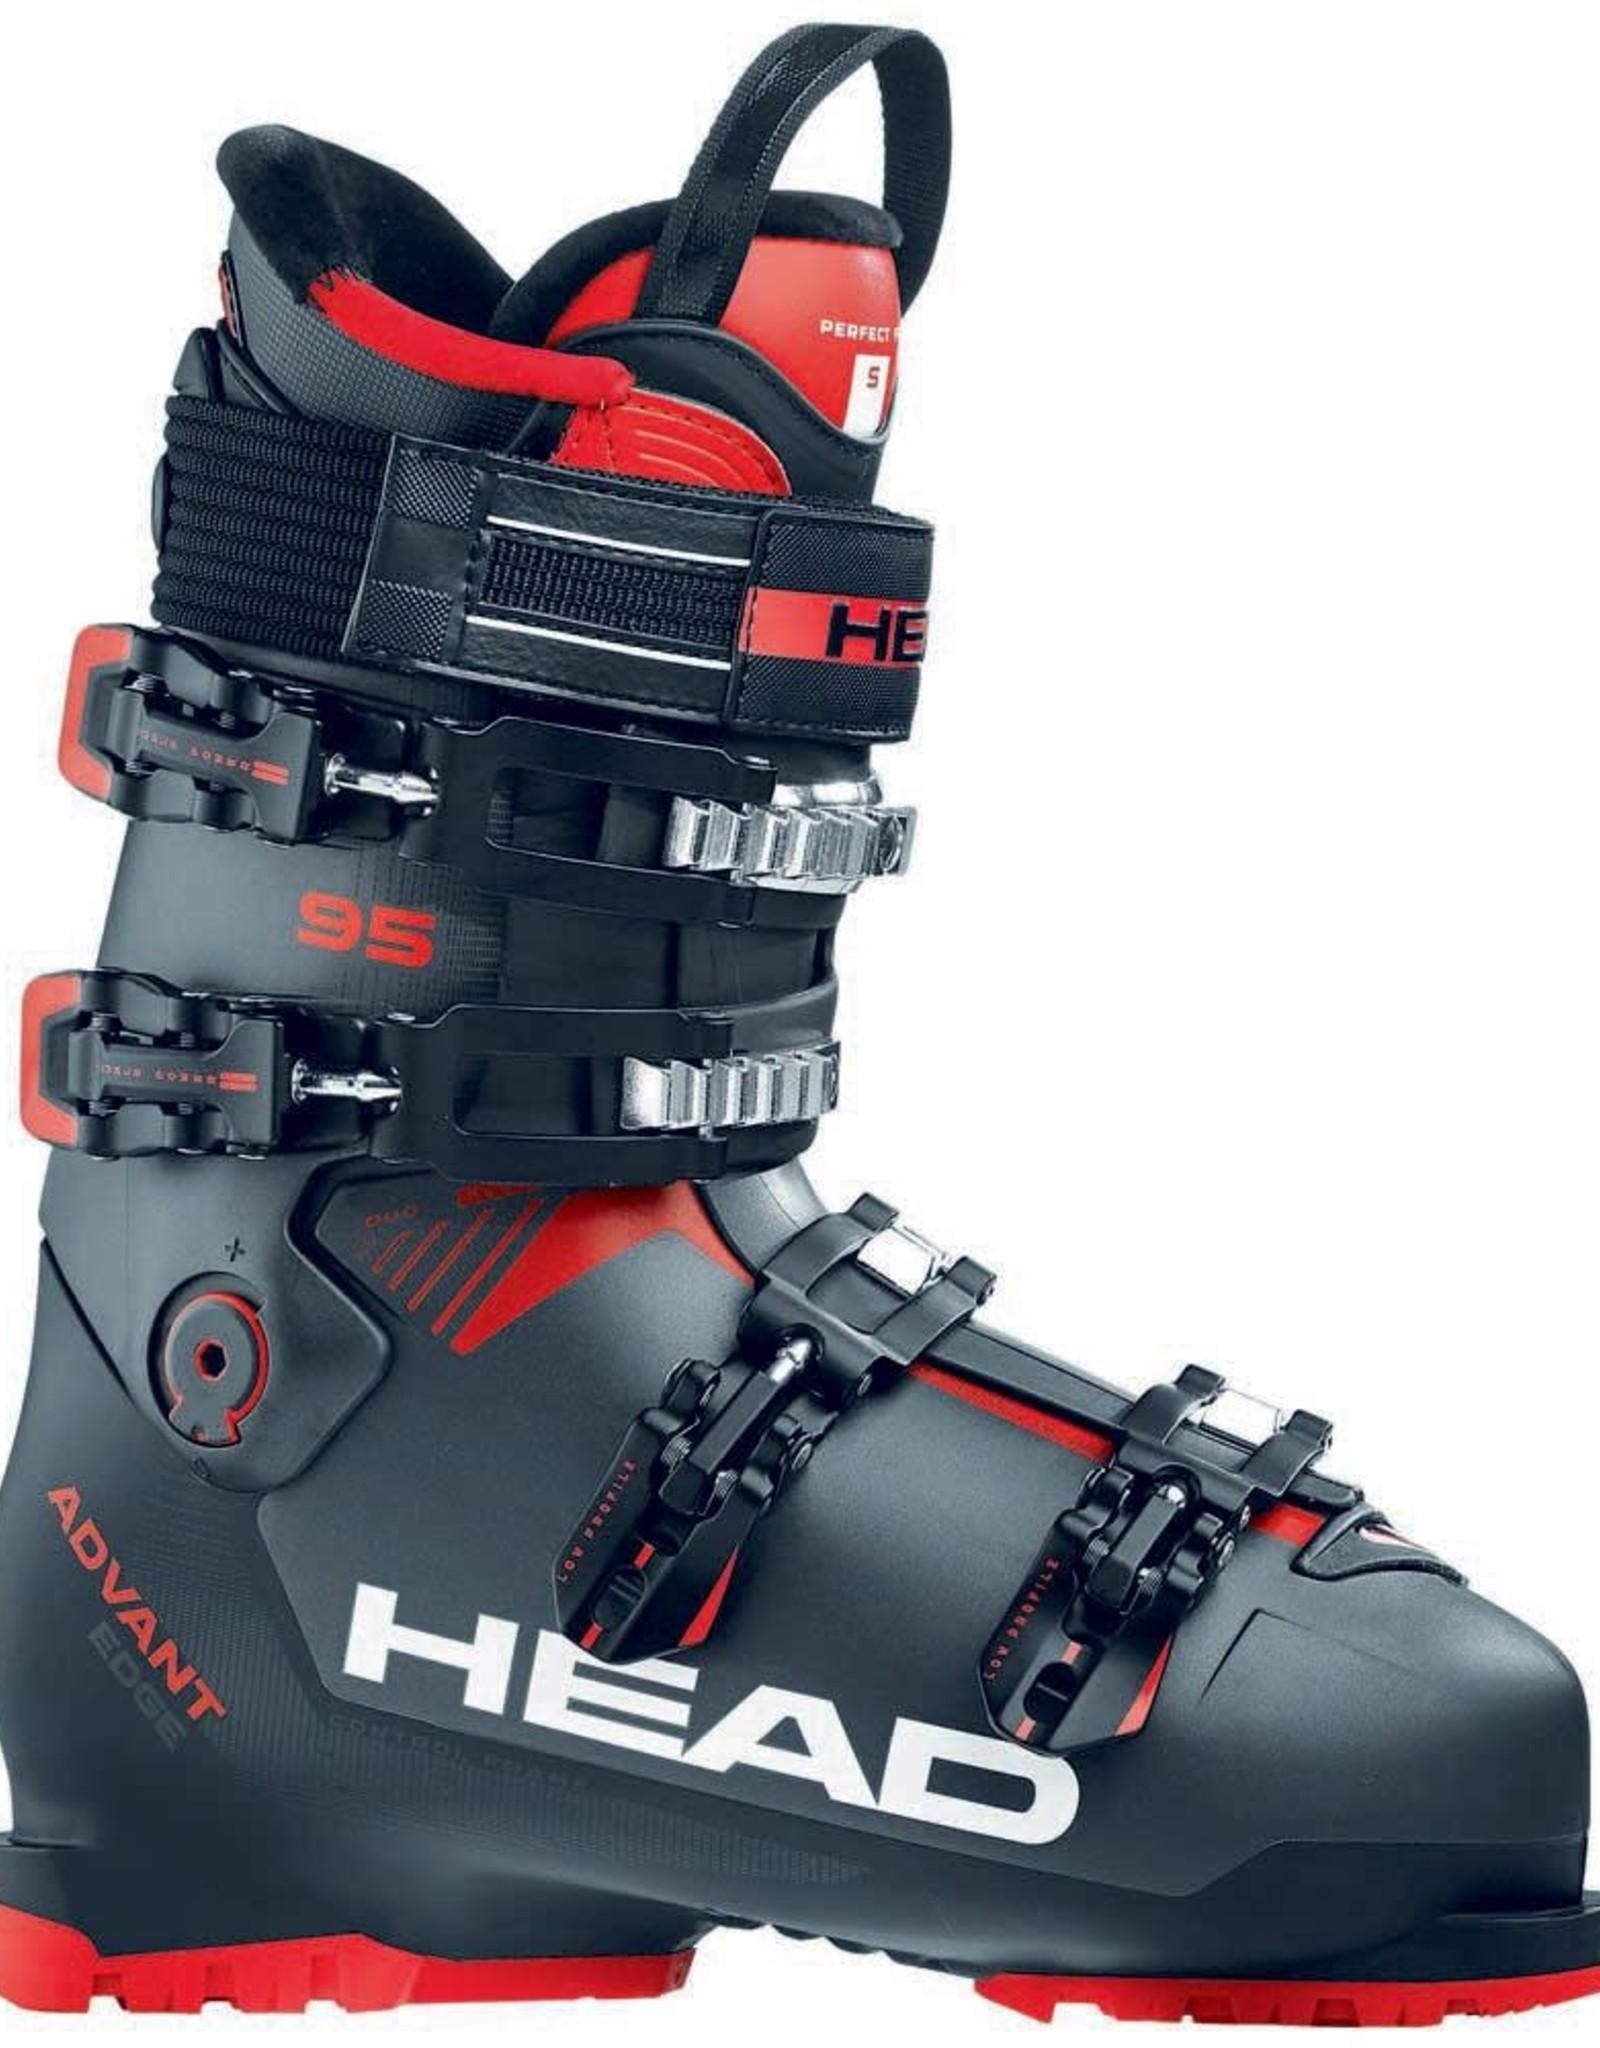 HEAD HEAD Ski Boots ADVANT EDGE 95 (18/19)